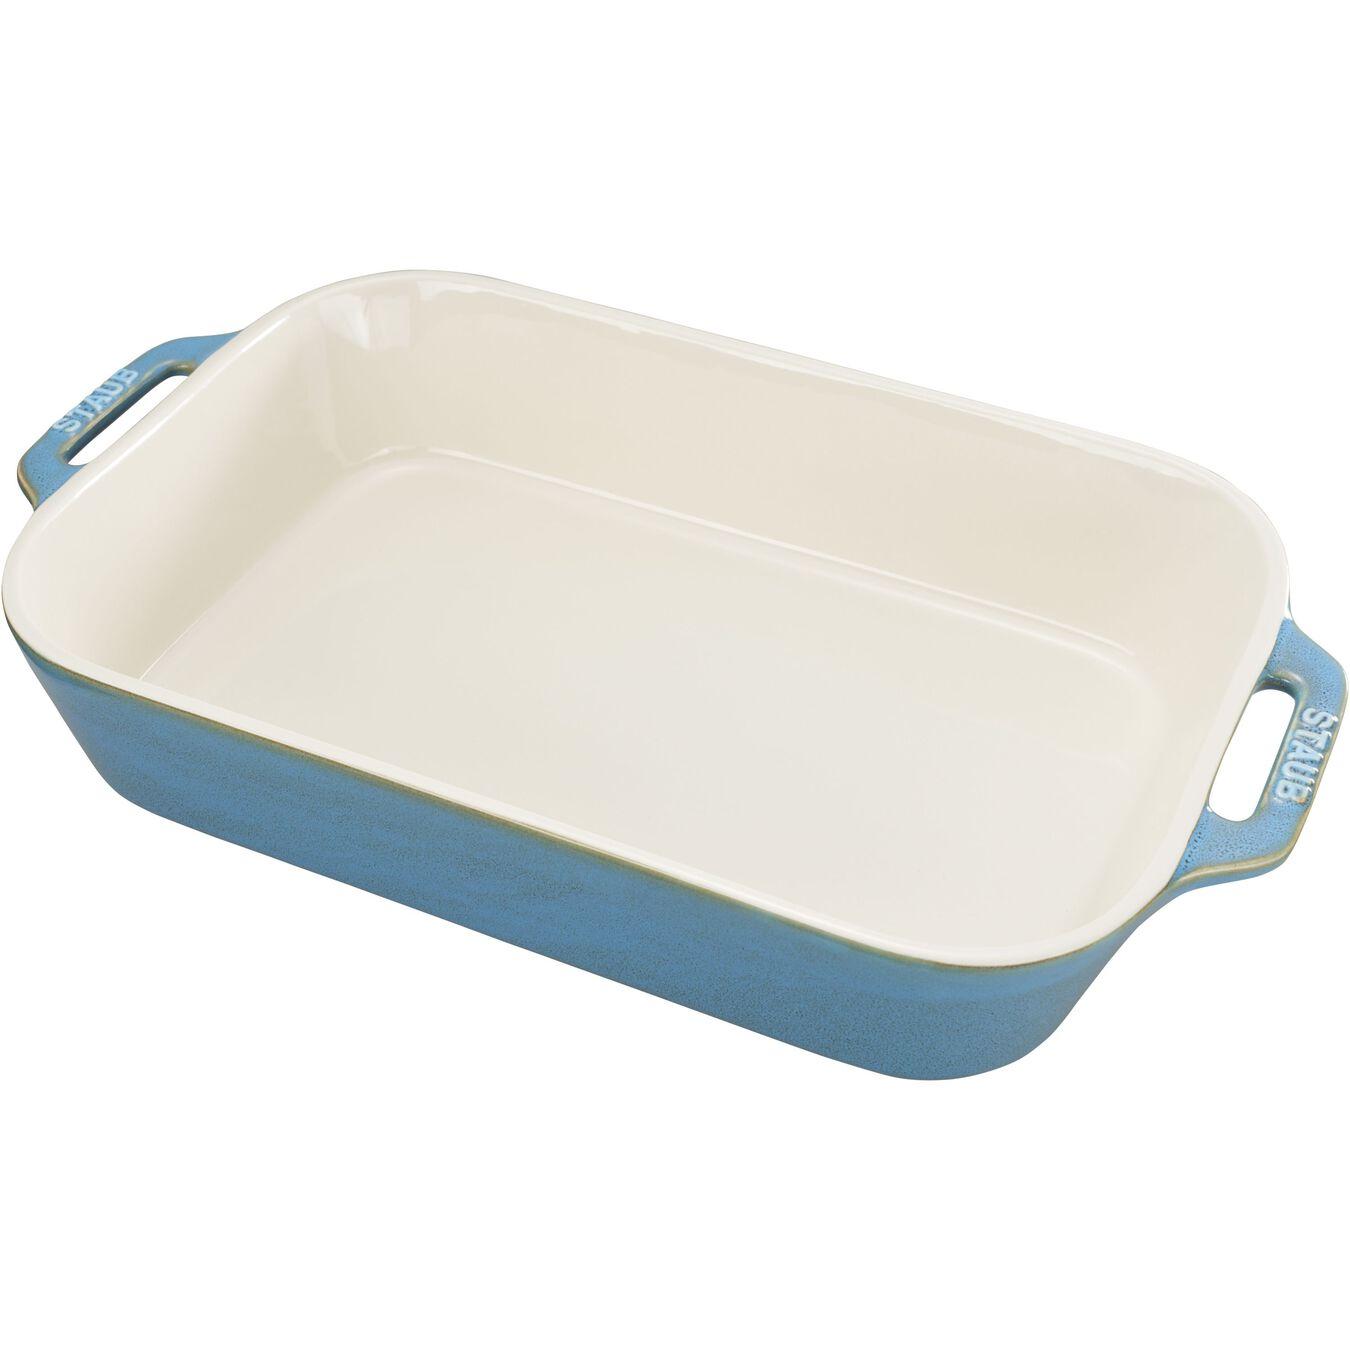 9-x 13-inch, rectangular, Baking Dish, rustic turquoise,,large 1